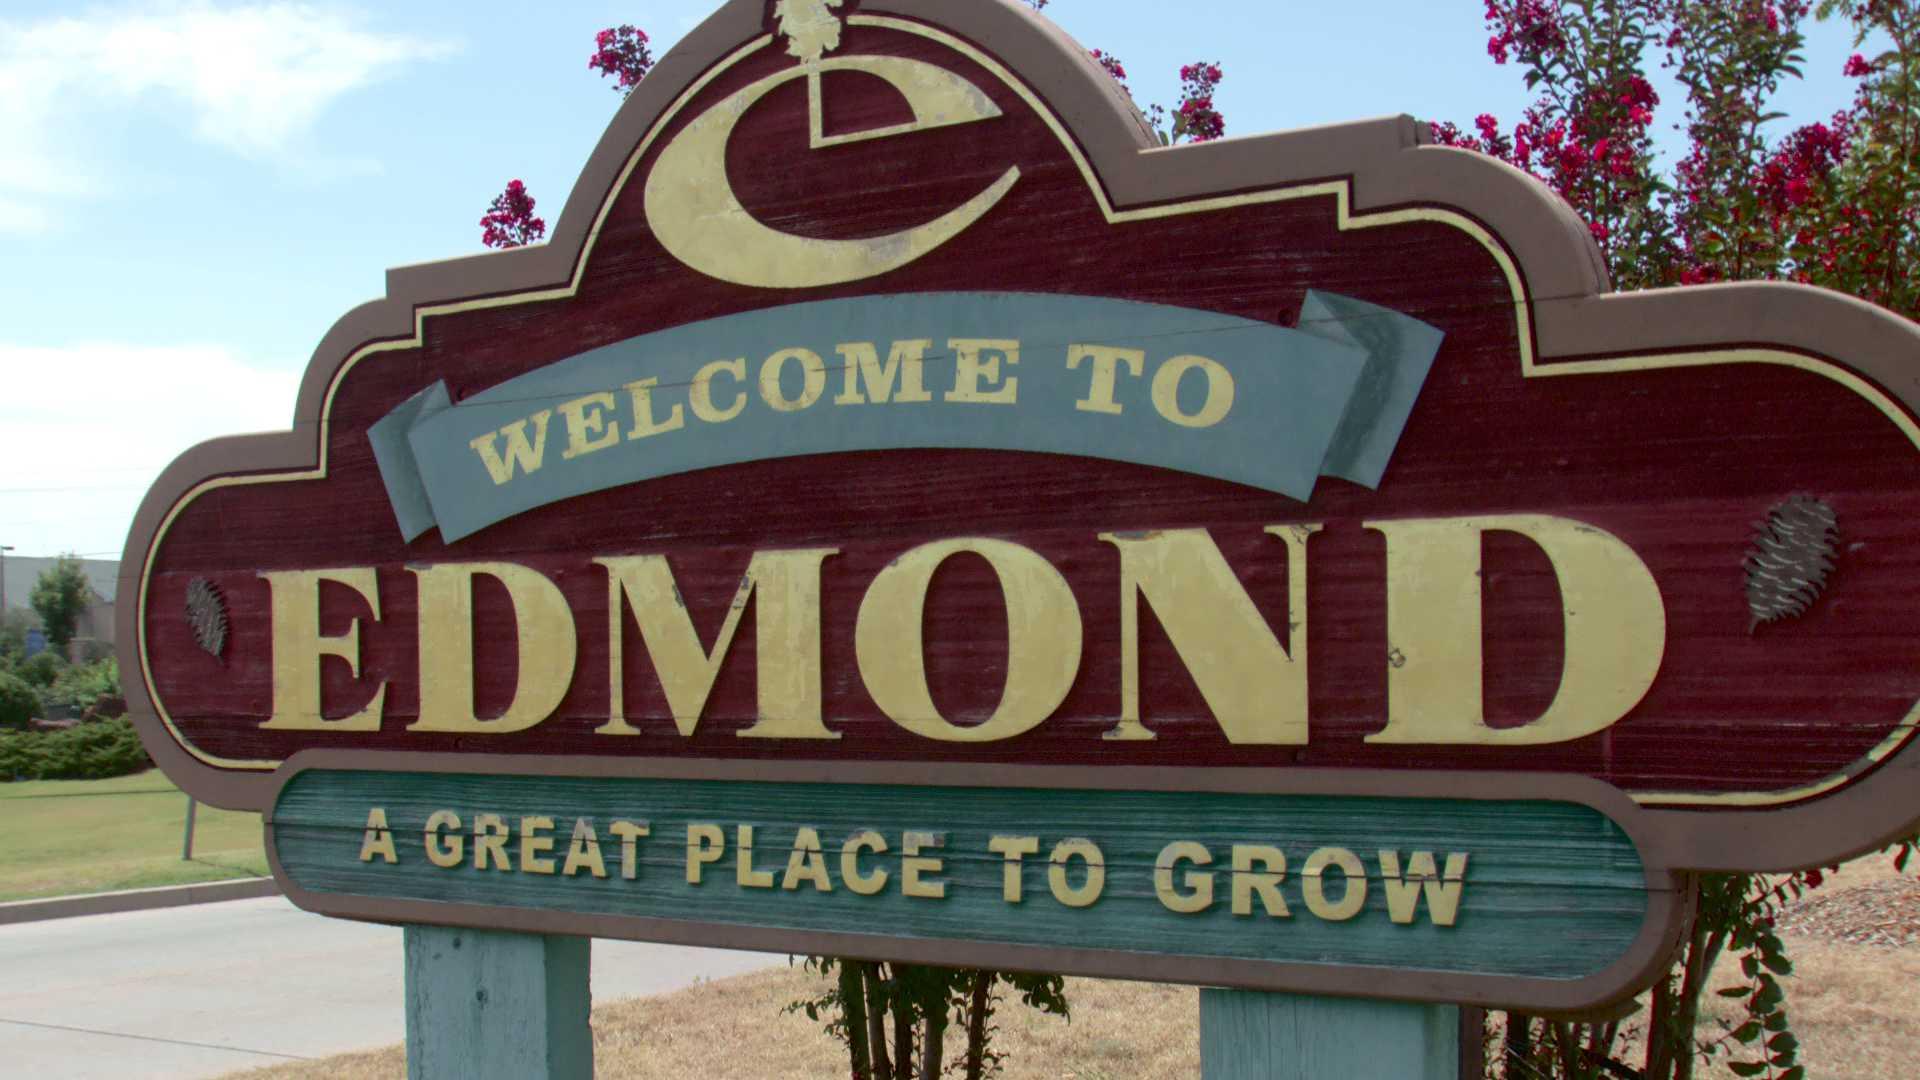 City of Edmond sign